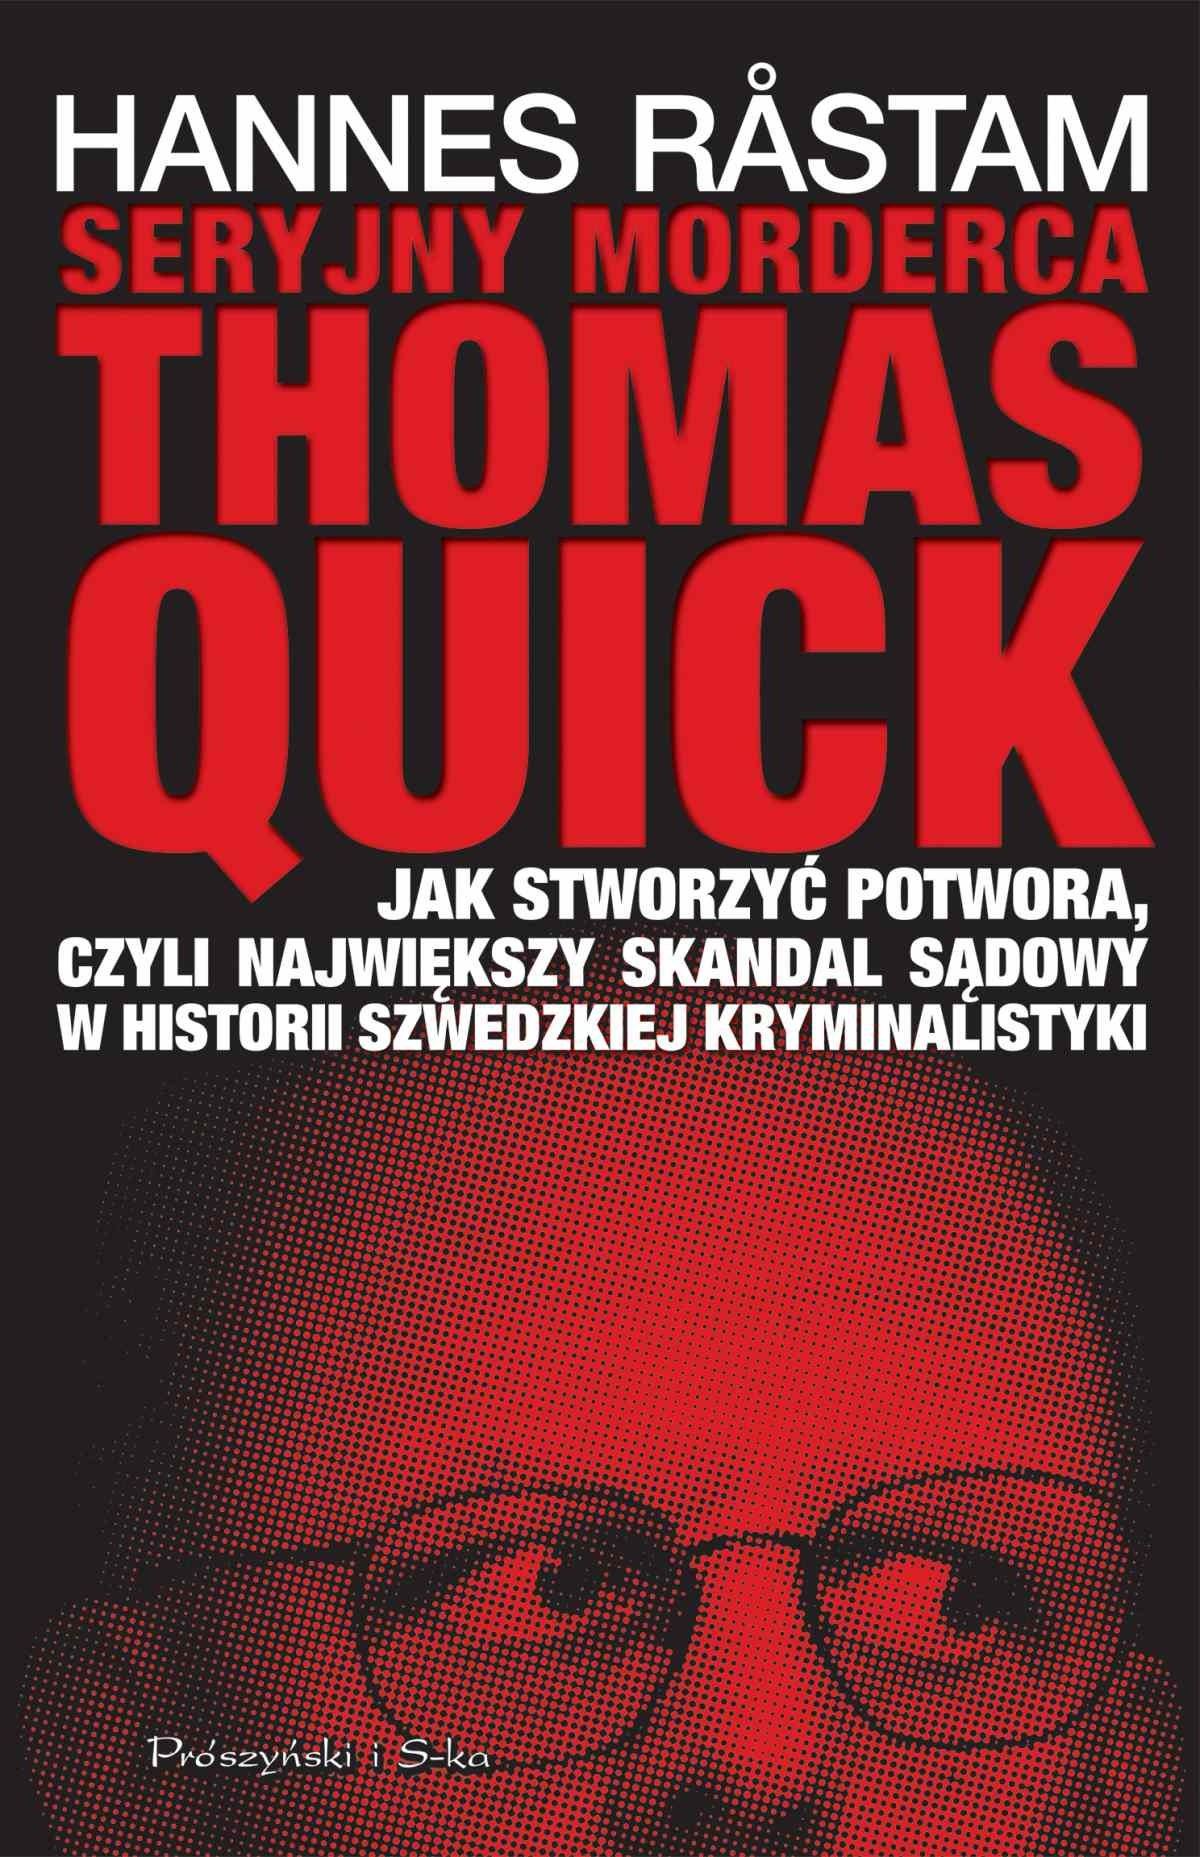 Seryjny morderca Thomas Quick - Ebook (Książka EPUB) do pobrania w formacie EPUB